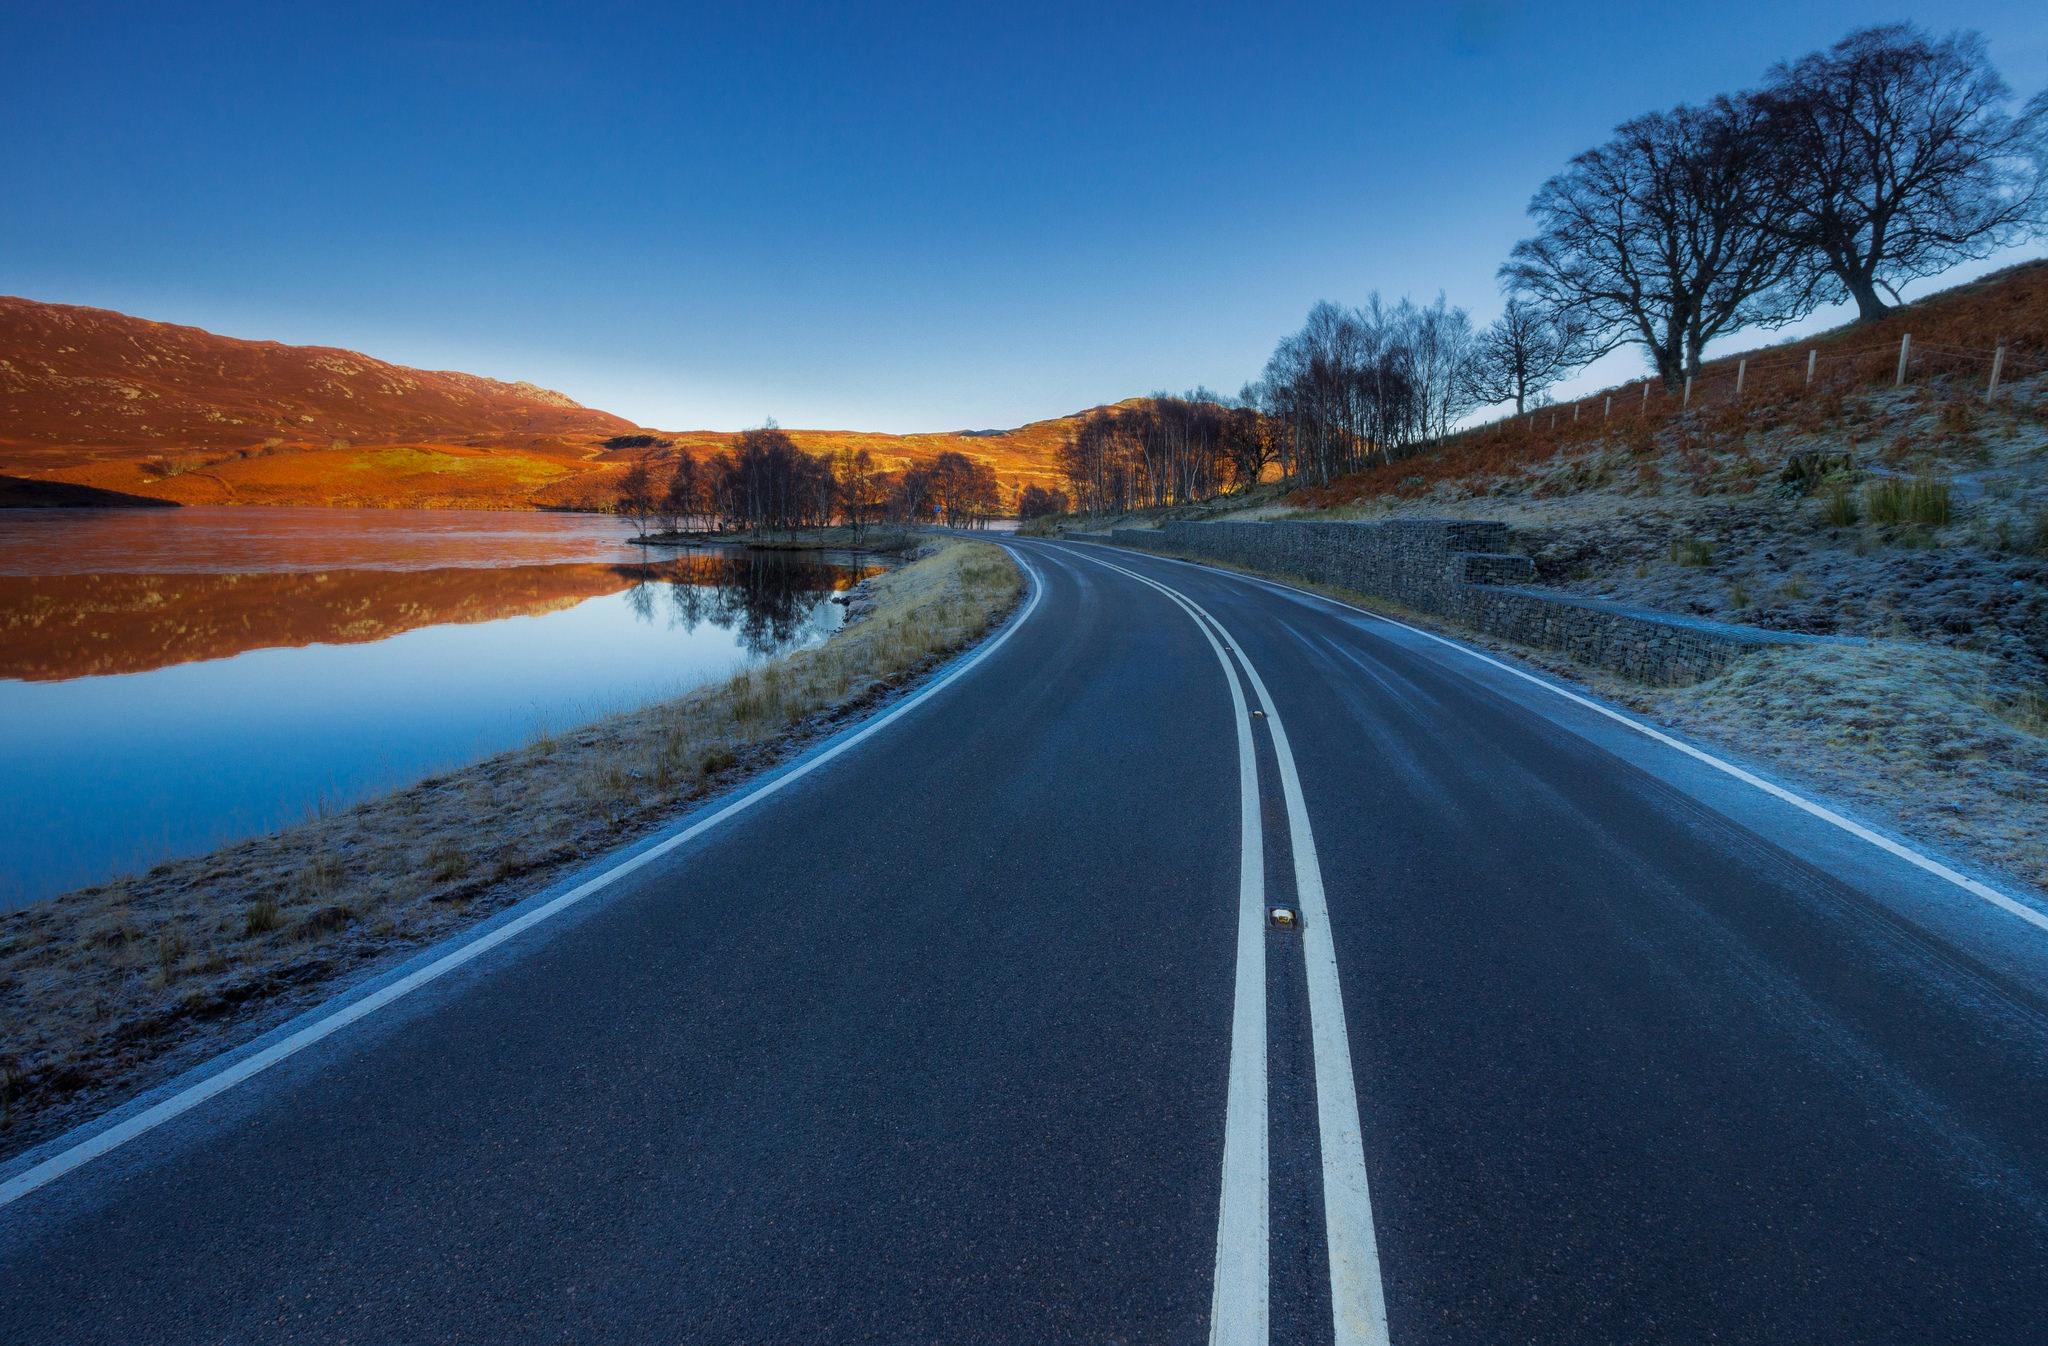 списке картинки дорога вода кованый